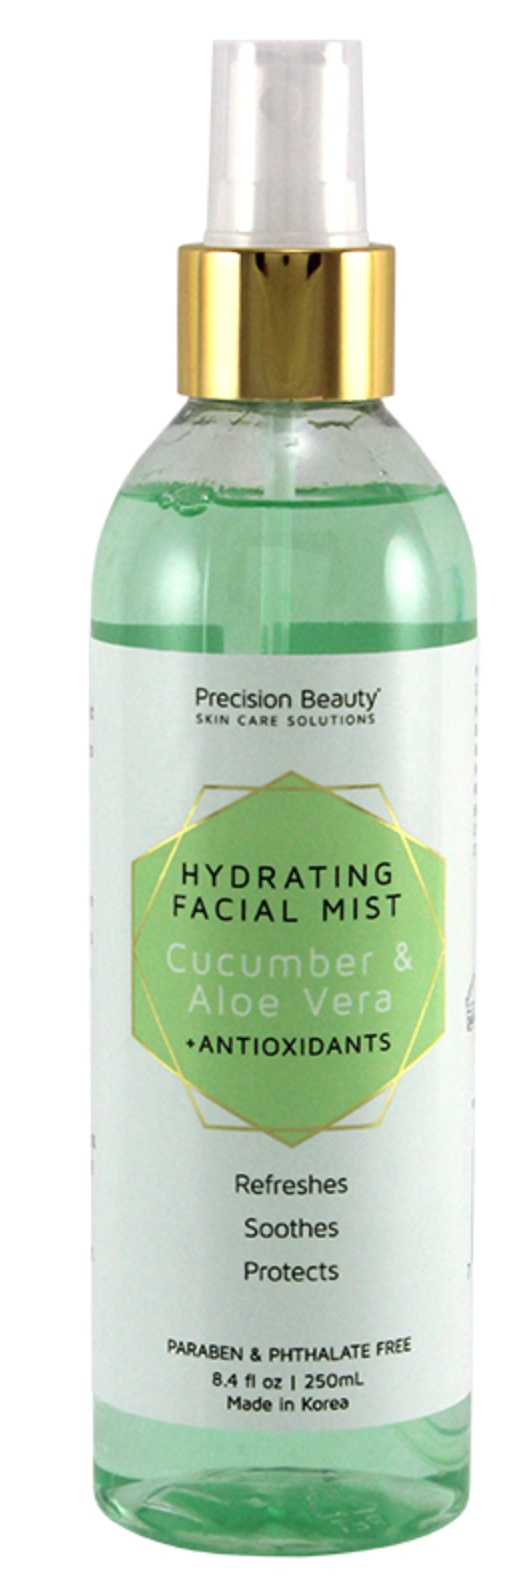 Precision Beauty Cucumber And Aloe Face Mist